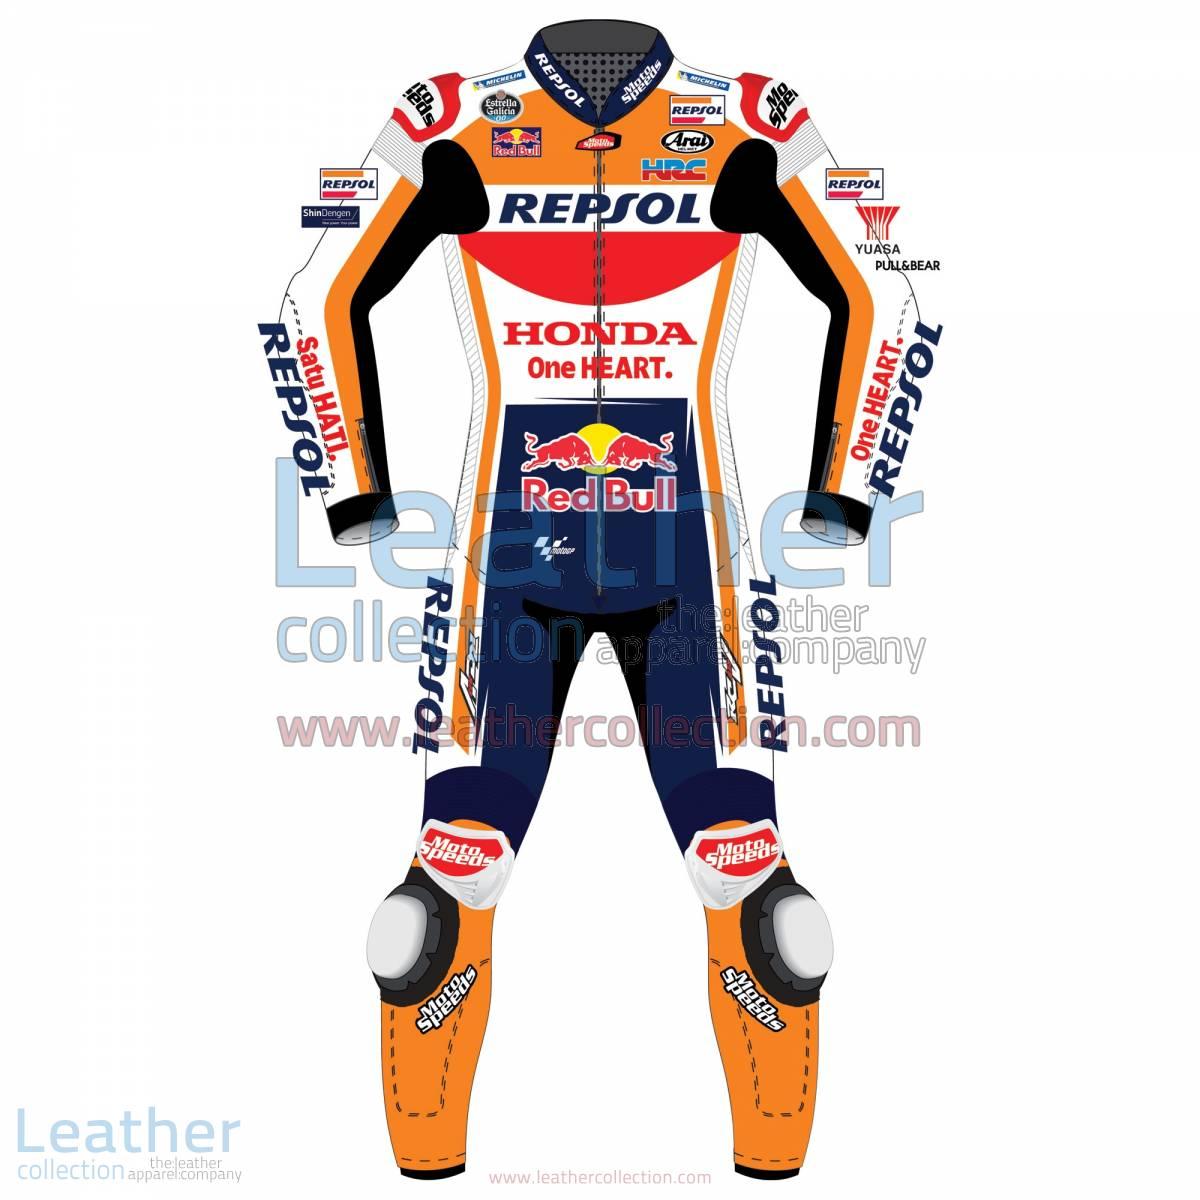 Dani Pedrosa Honda Repsol MotoGP 2018 Leather Suit | Dani Pedrosa Honda Repsol MotoGP 2018 Leather Suit